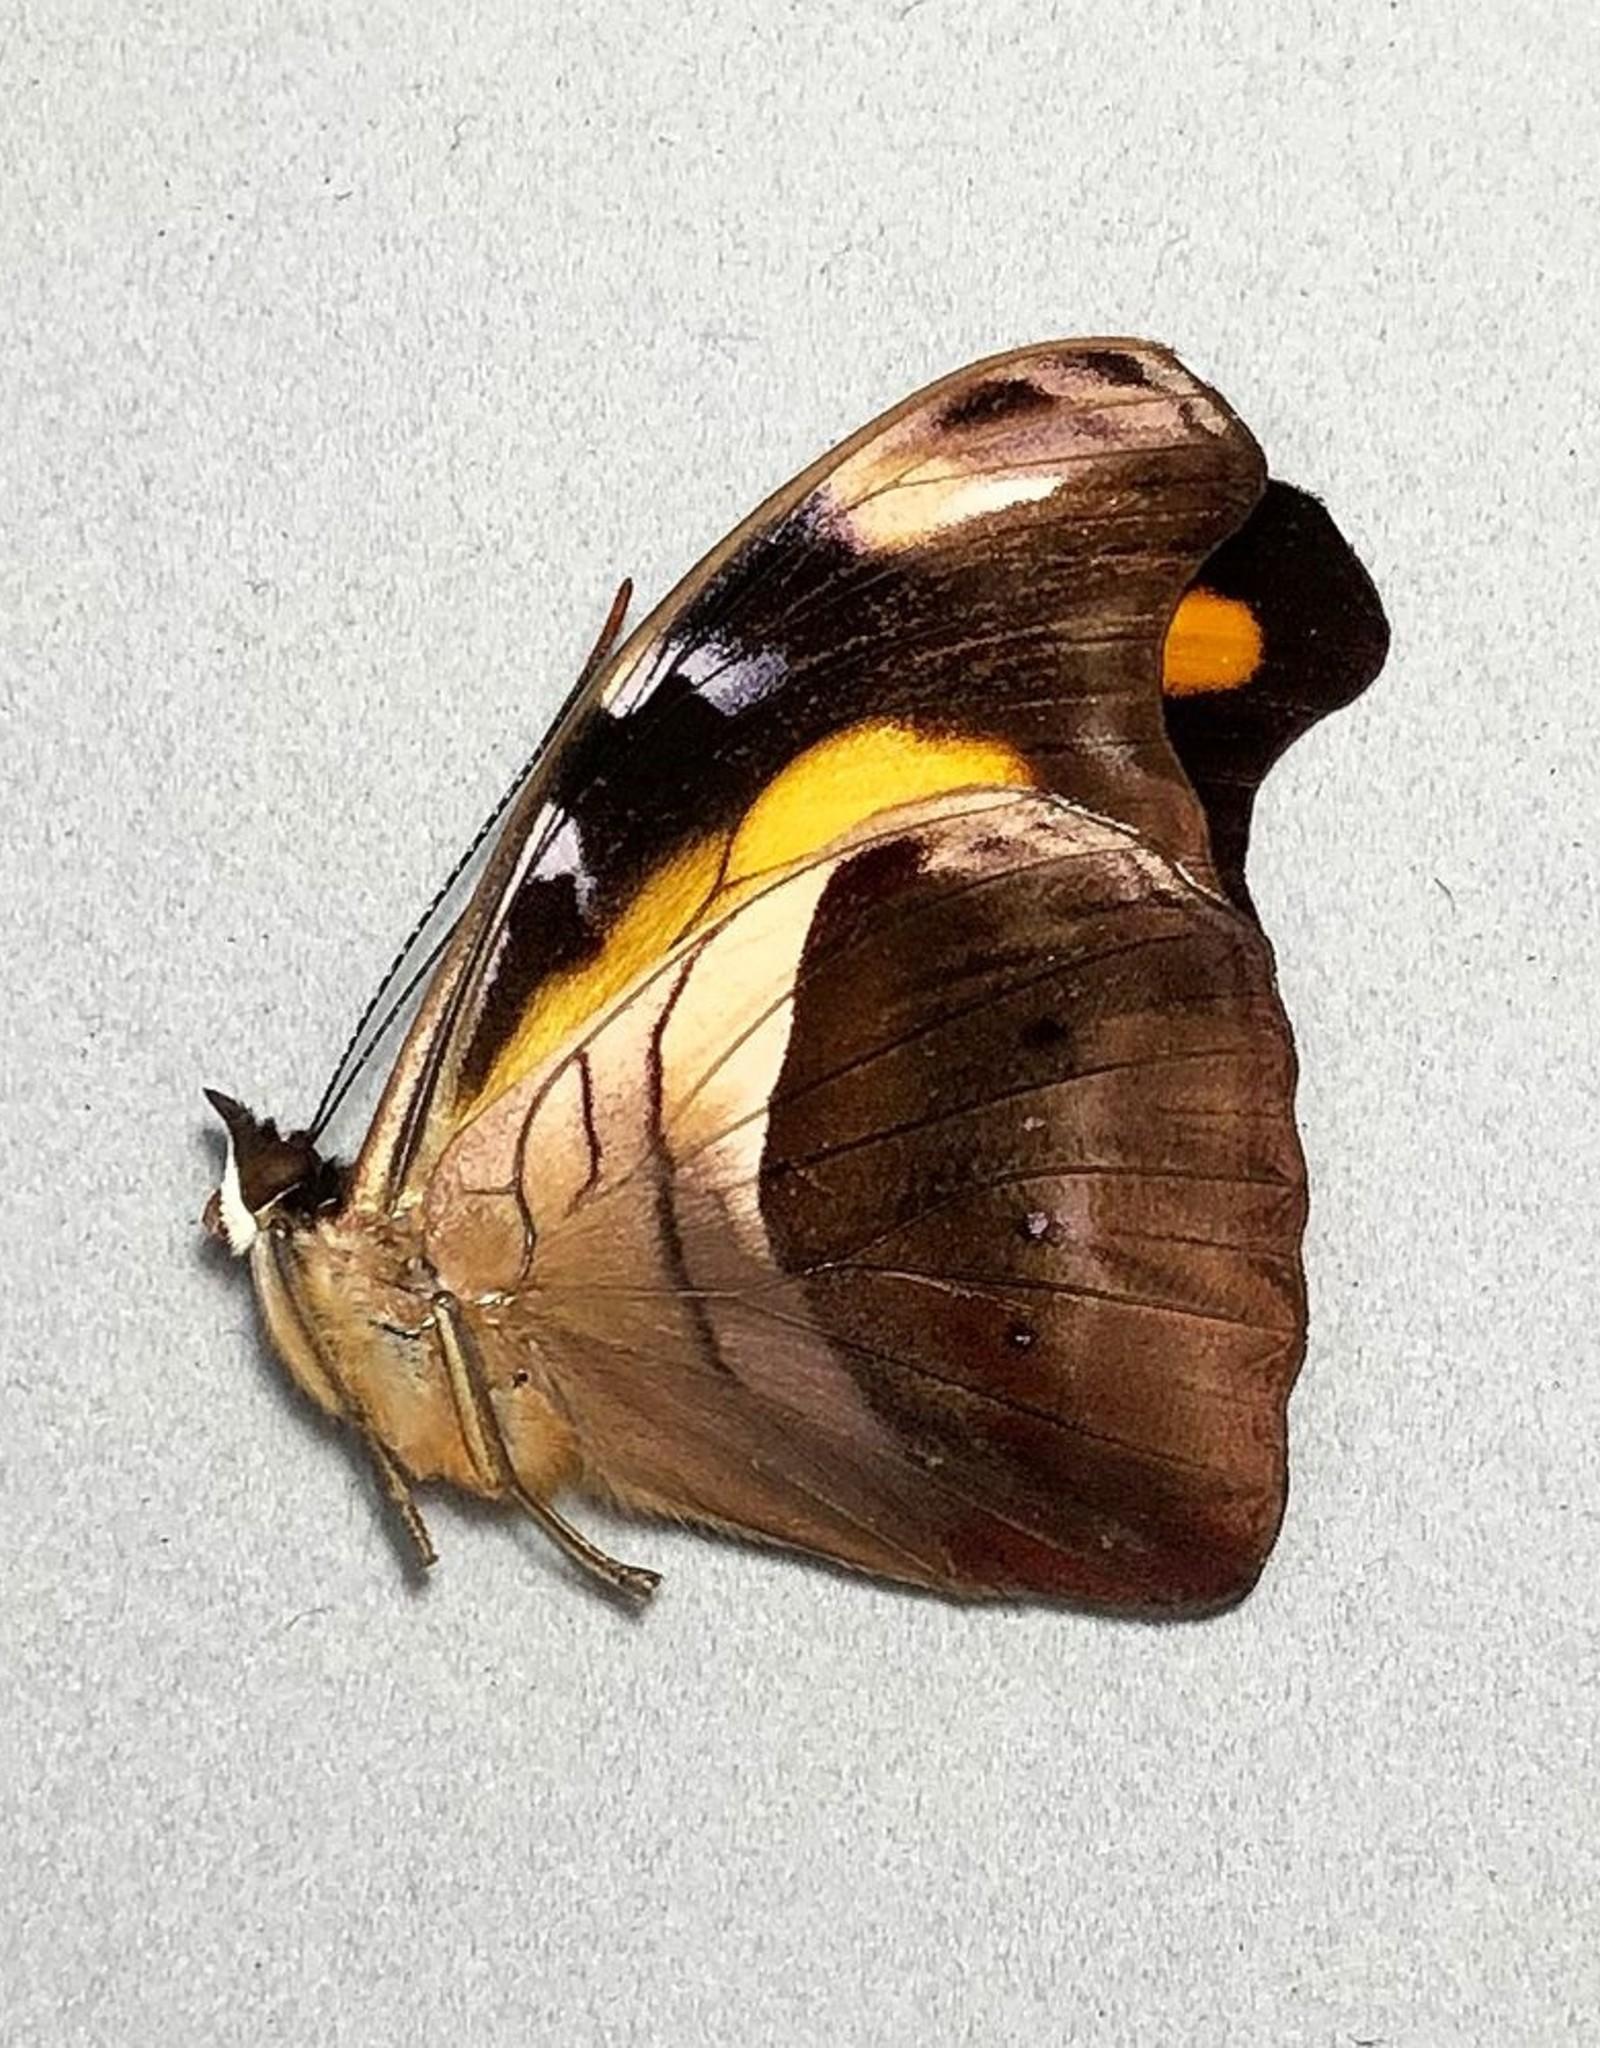 Catonephele chromis godmani M A1 Bolivia